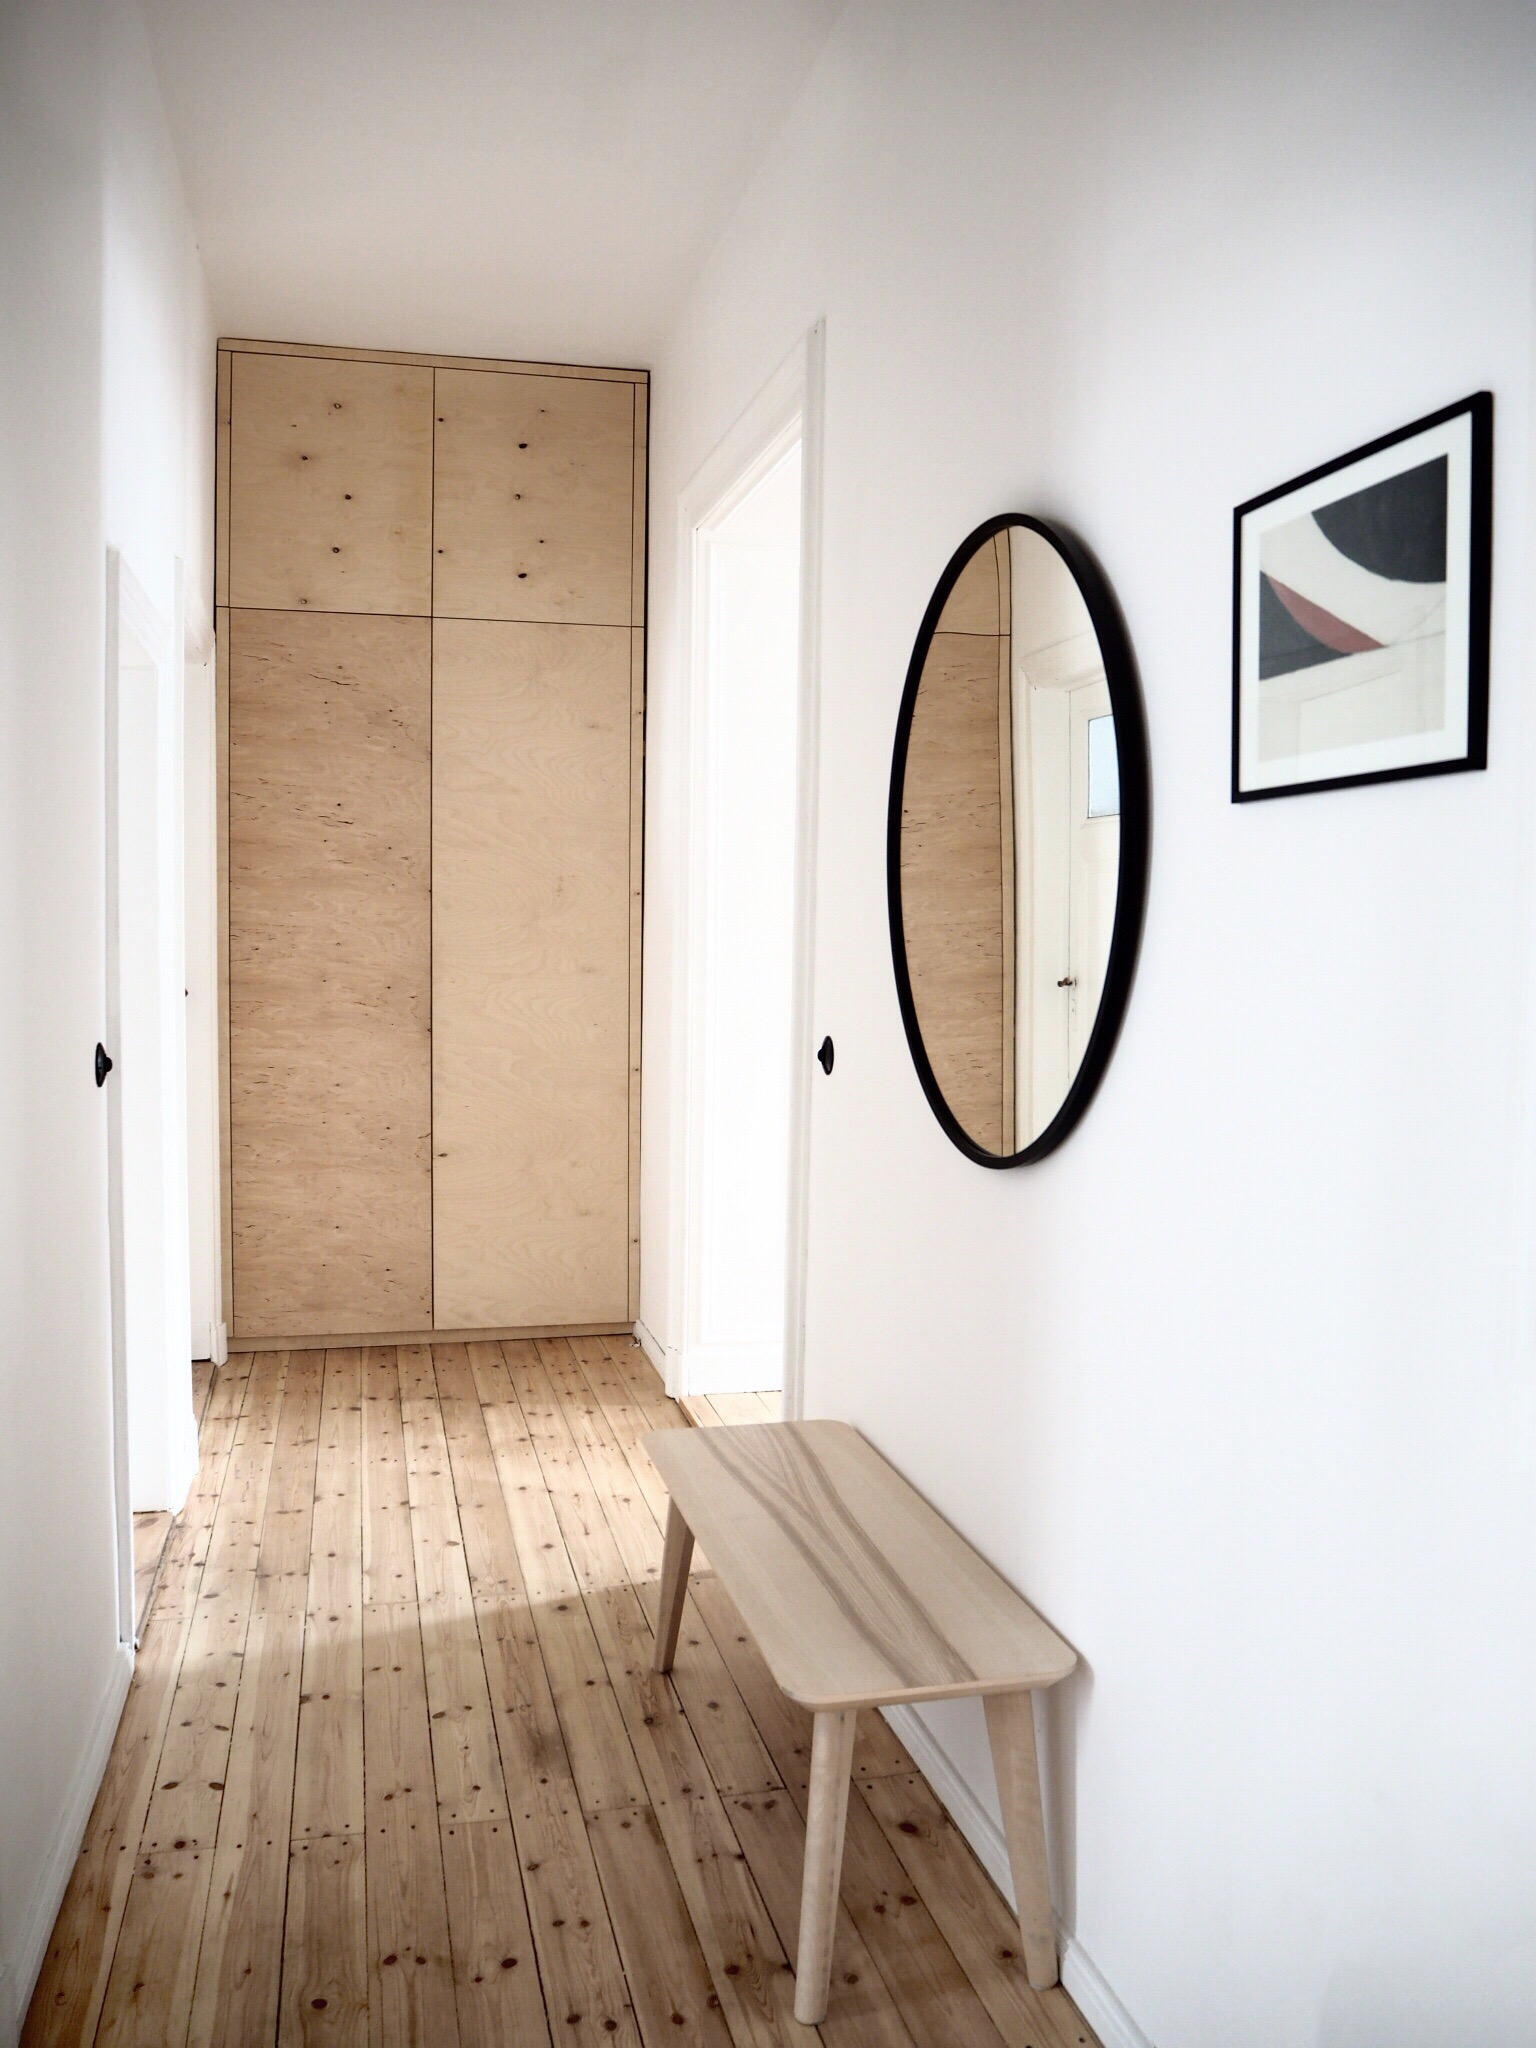 Selina Lauck - home tour - hallway